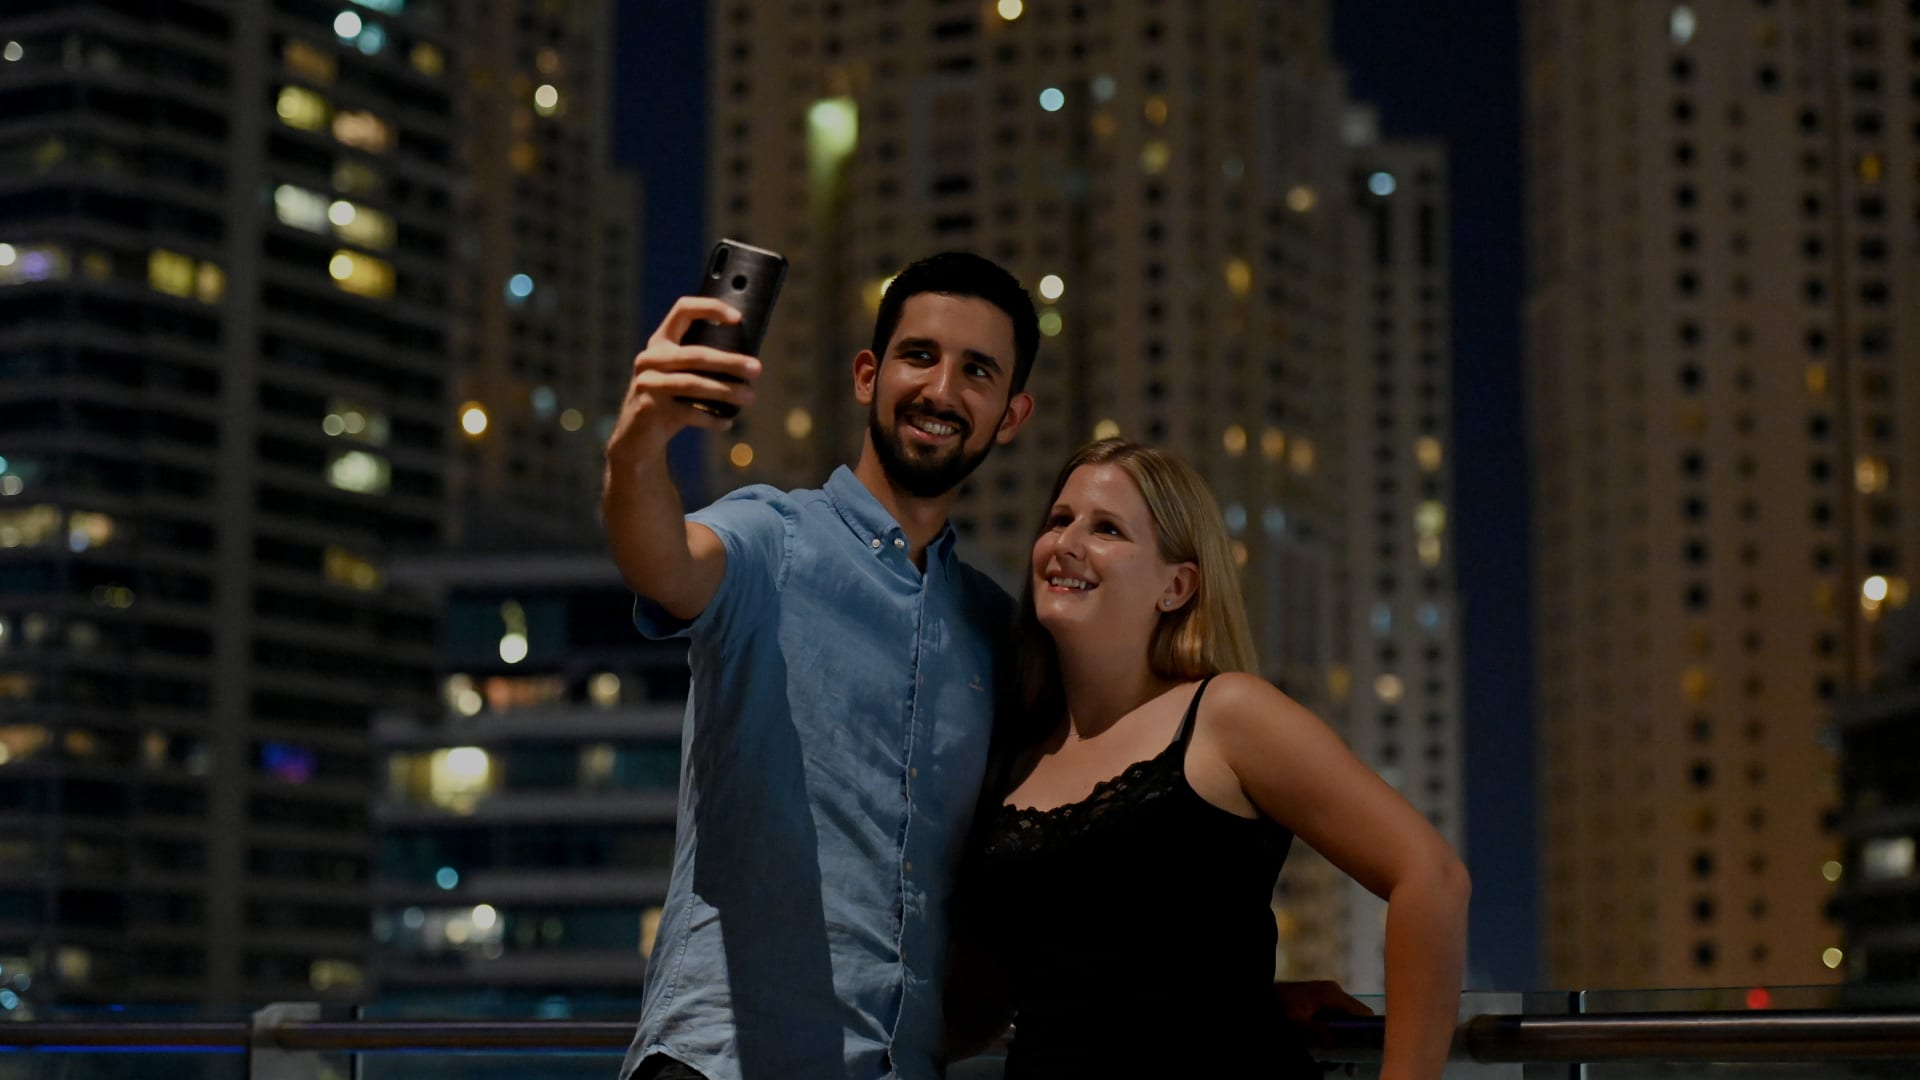 Gratis dating Dubai